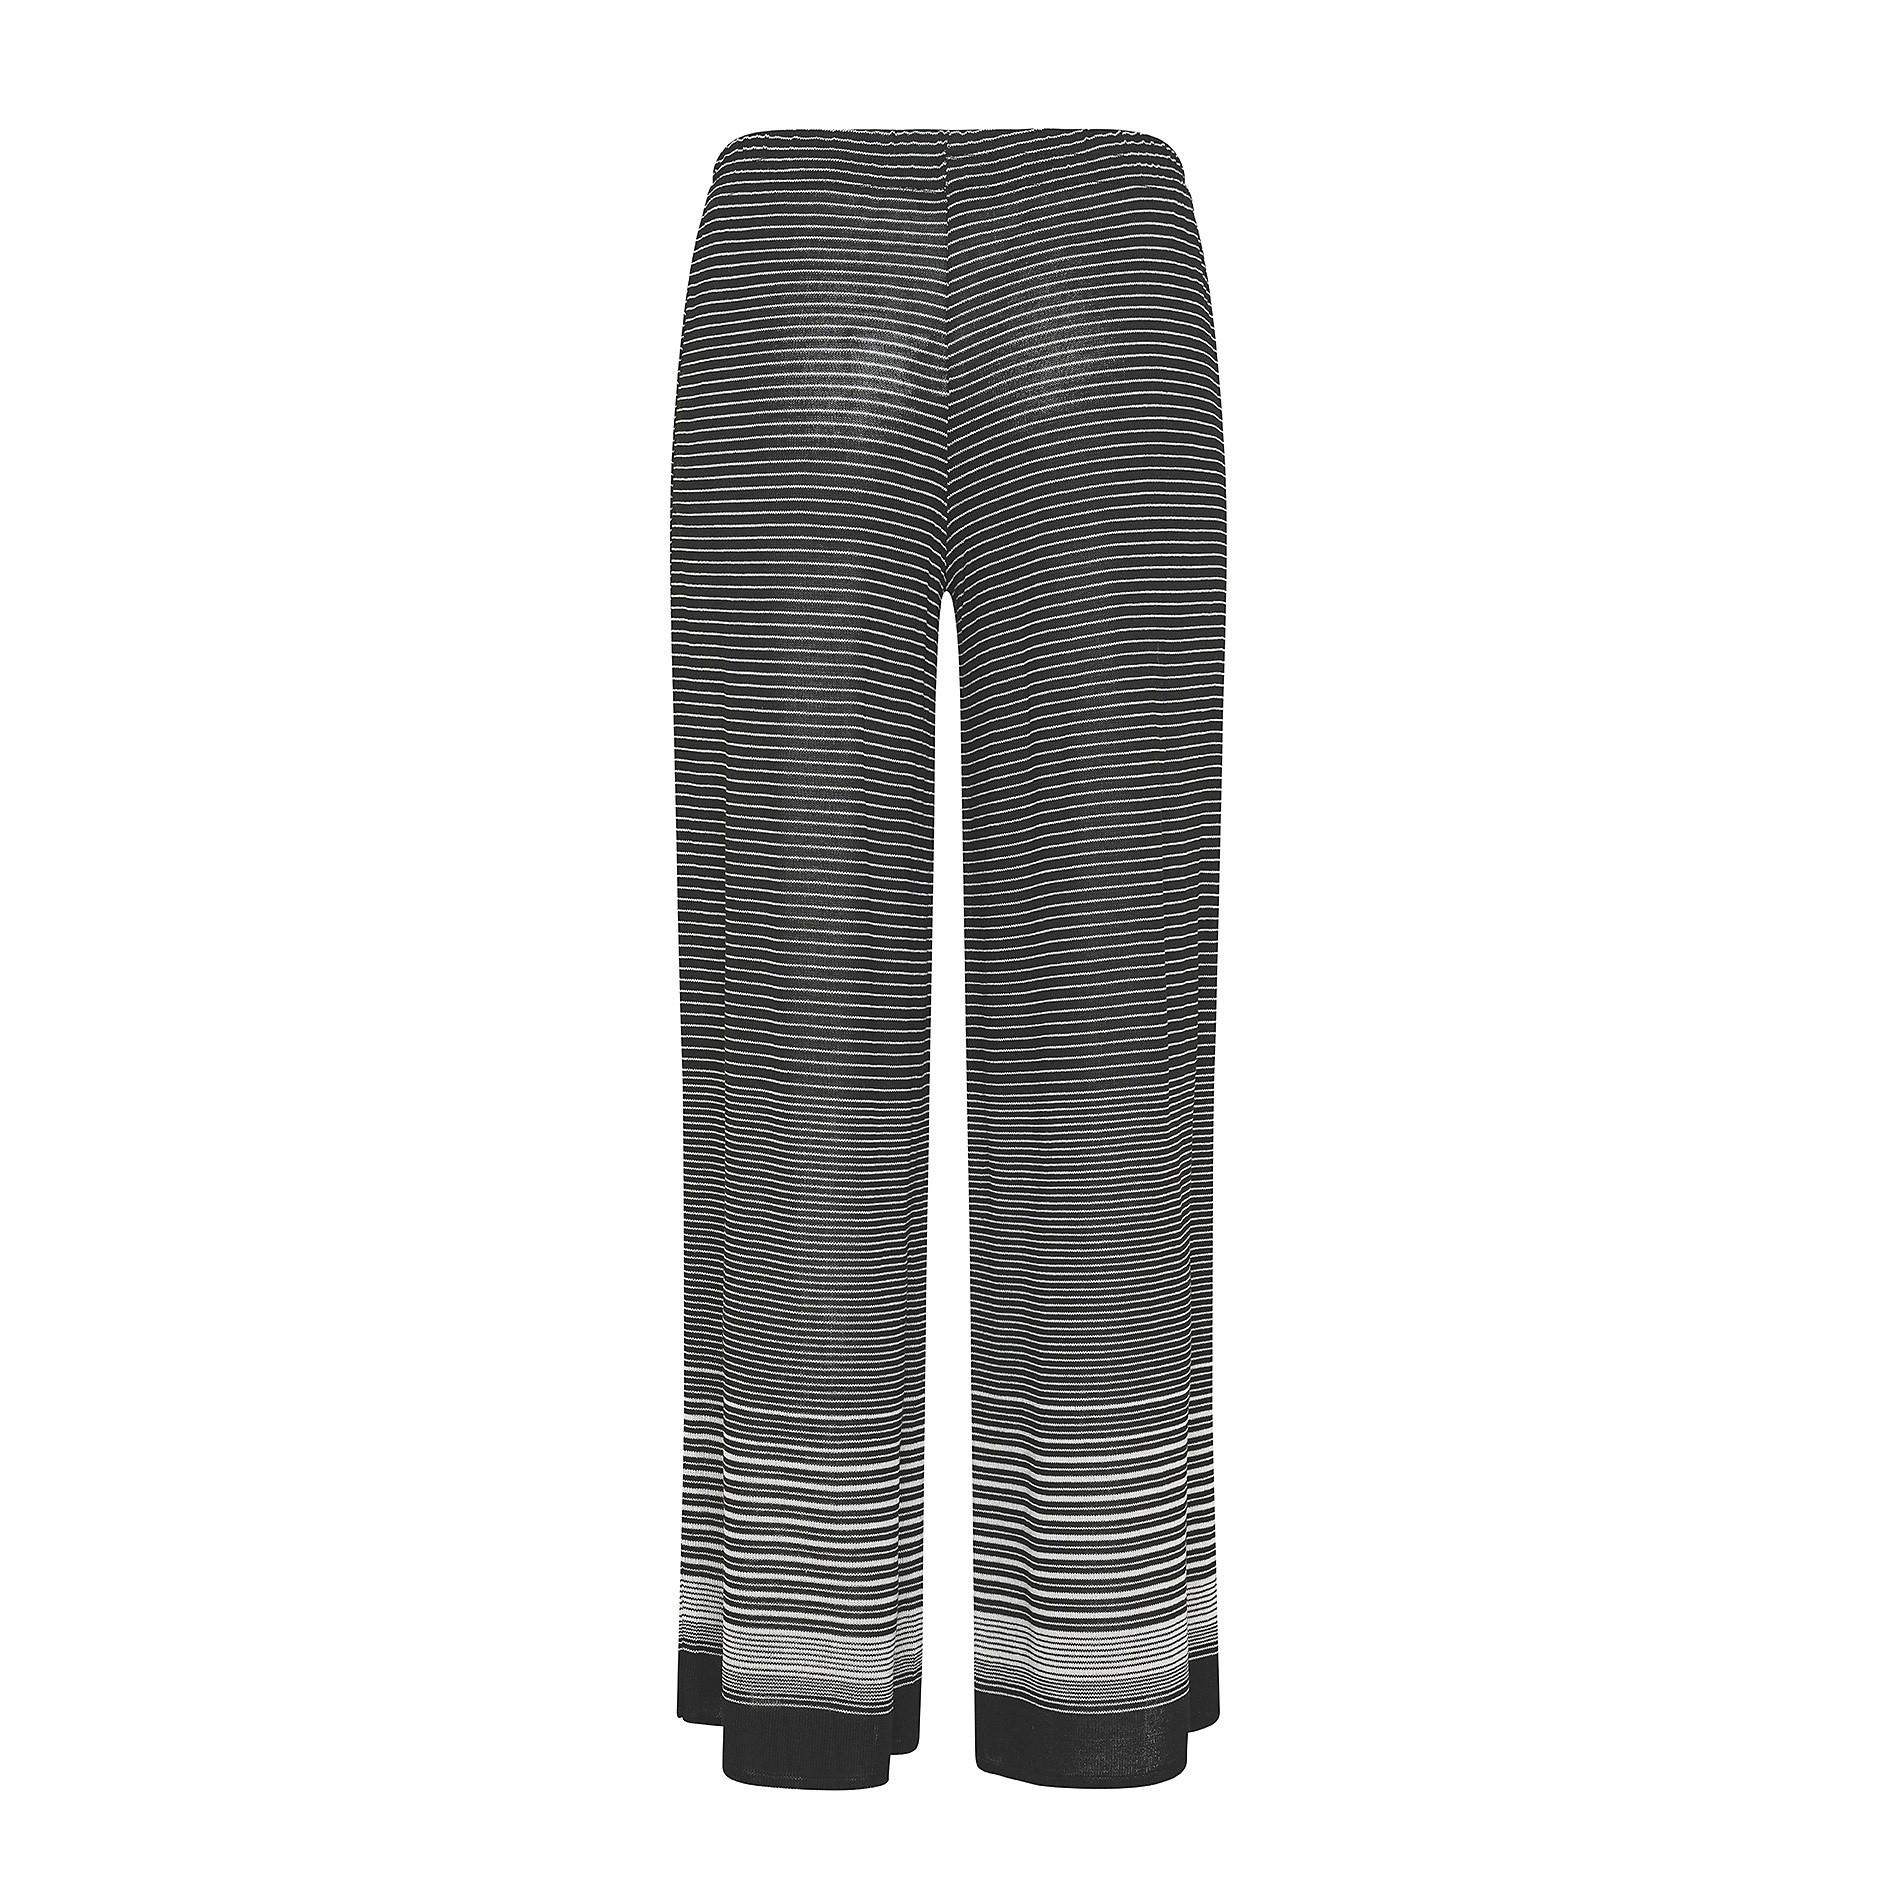 Pantalone ampio leggero a righe Koan, Nero, large image number 1